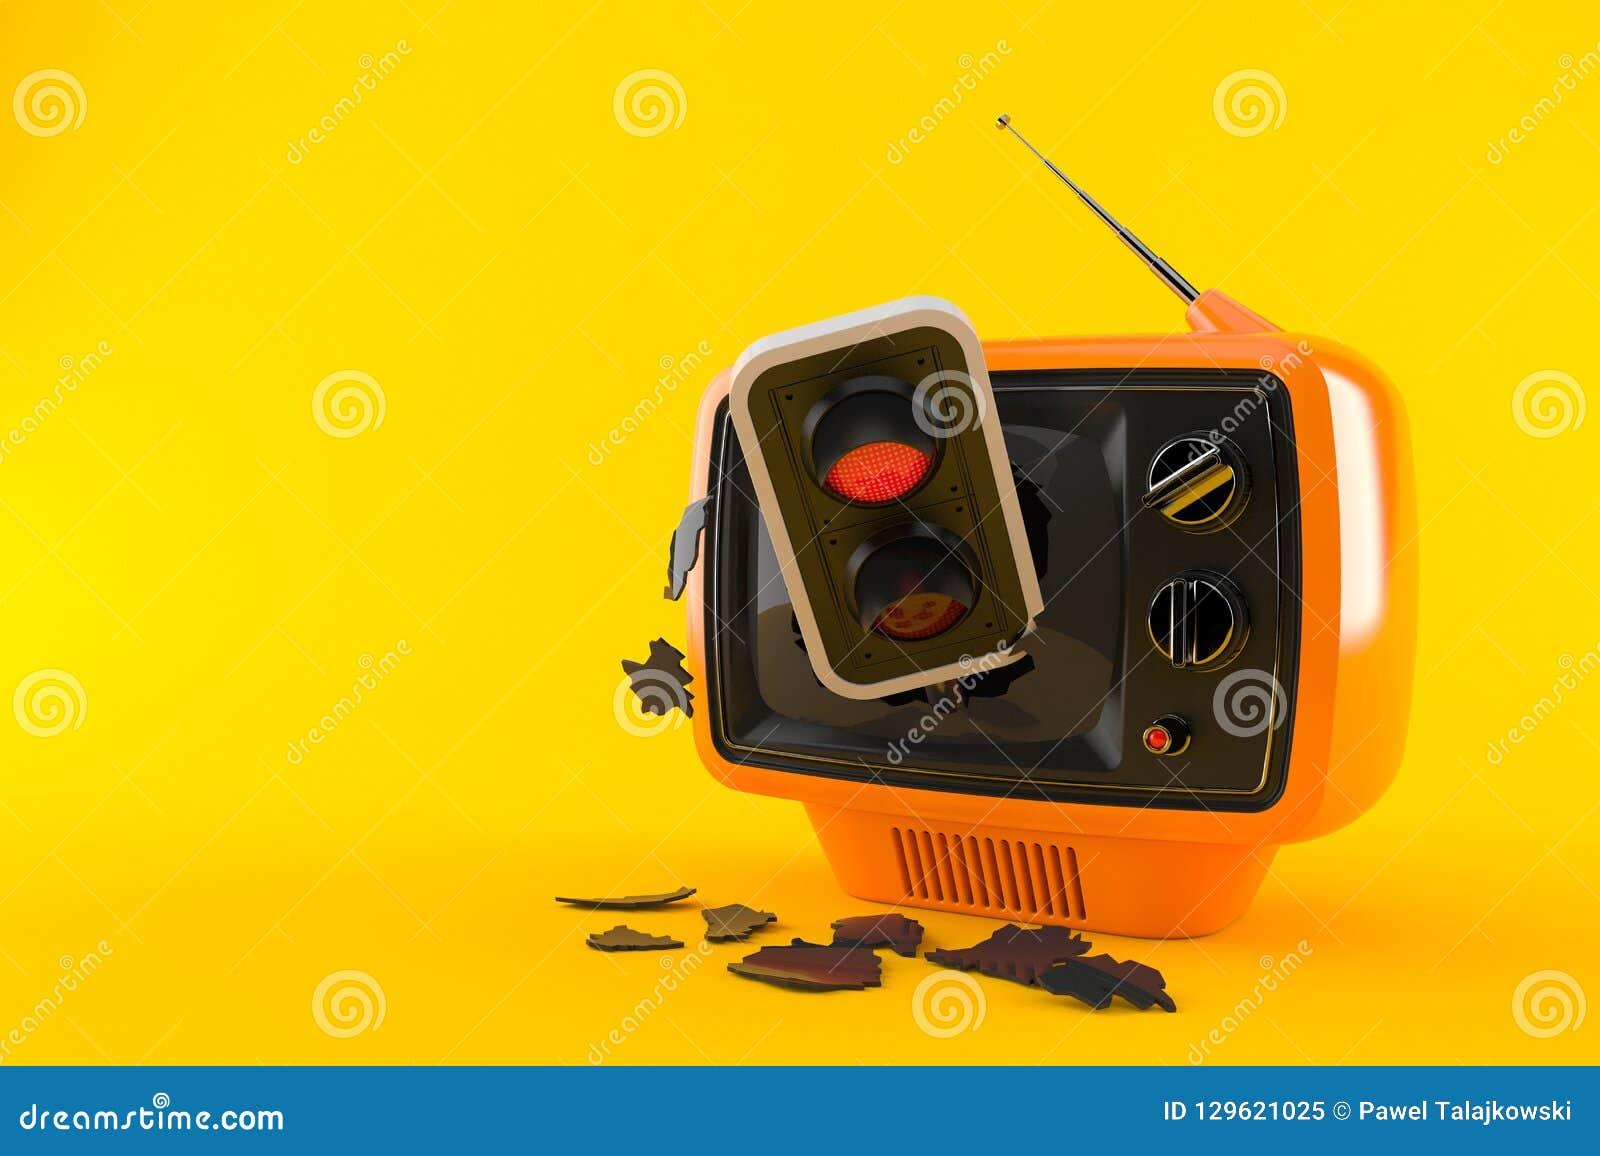 Retro TV with red traffic light